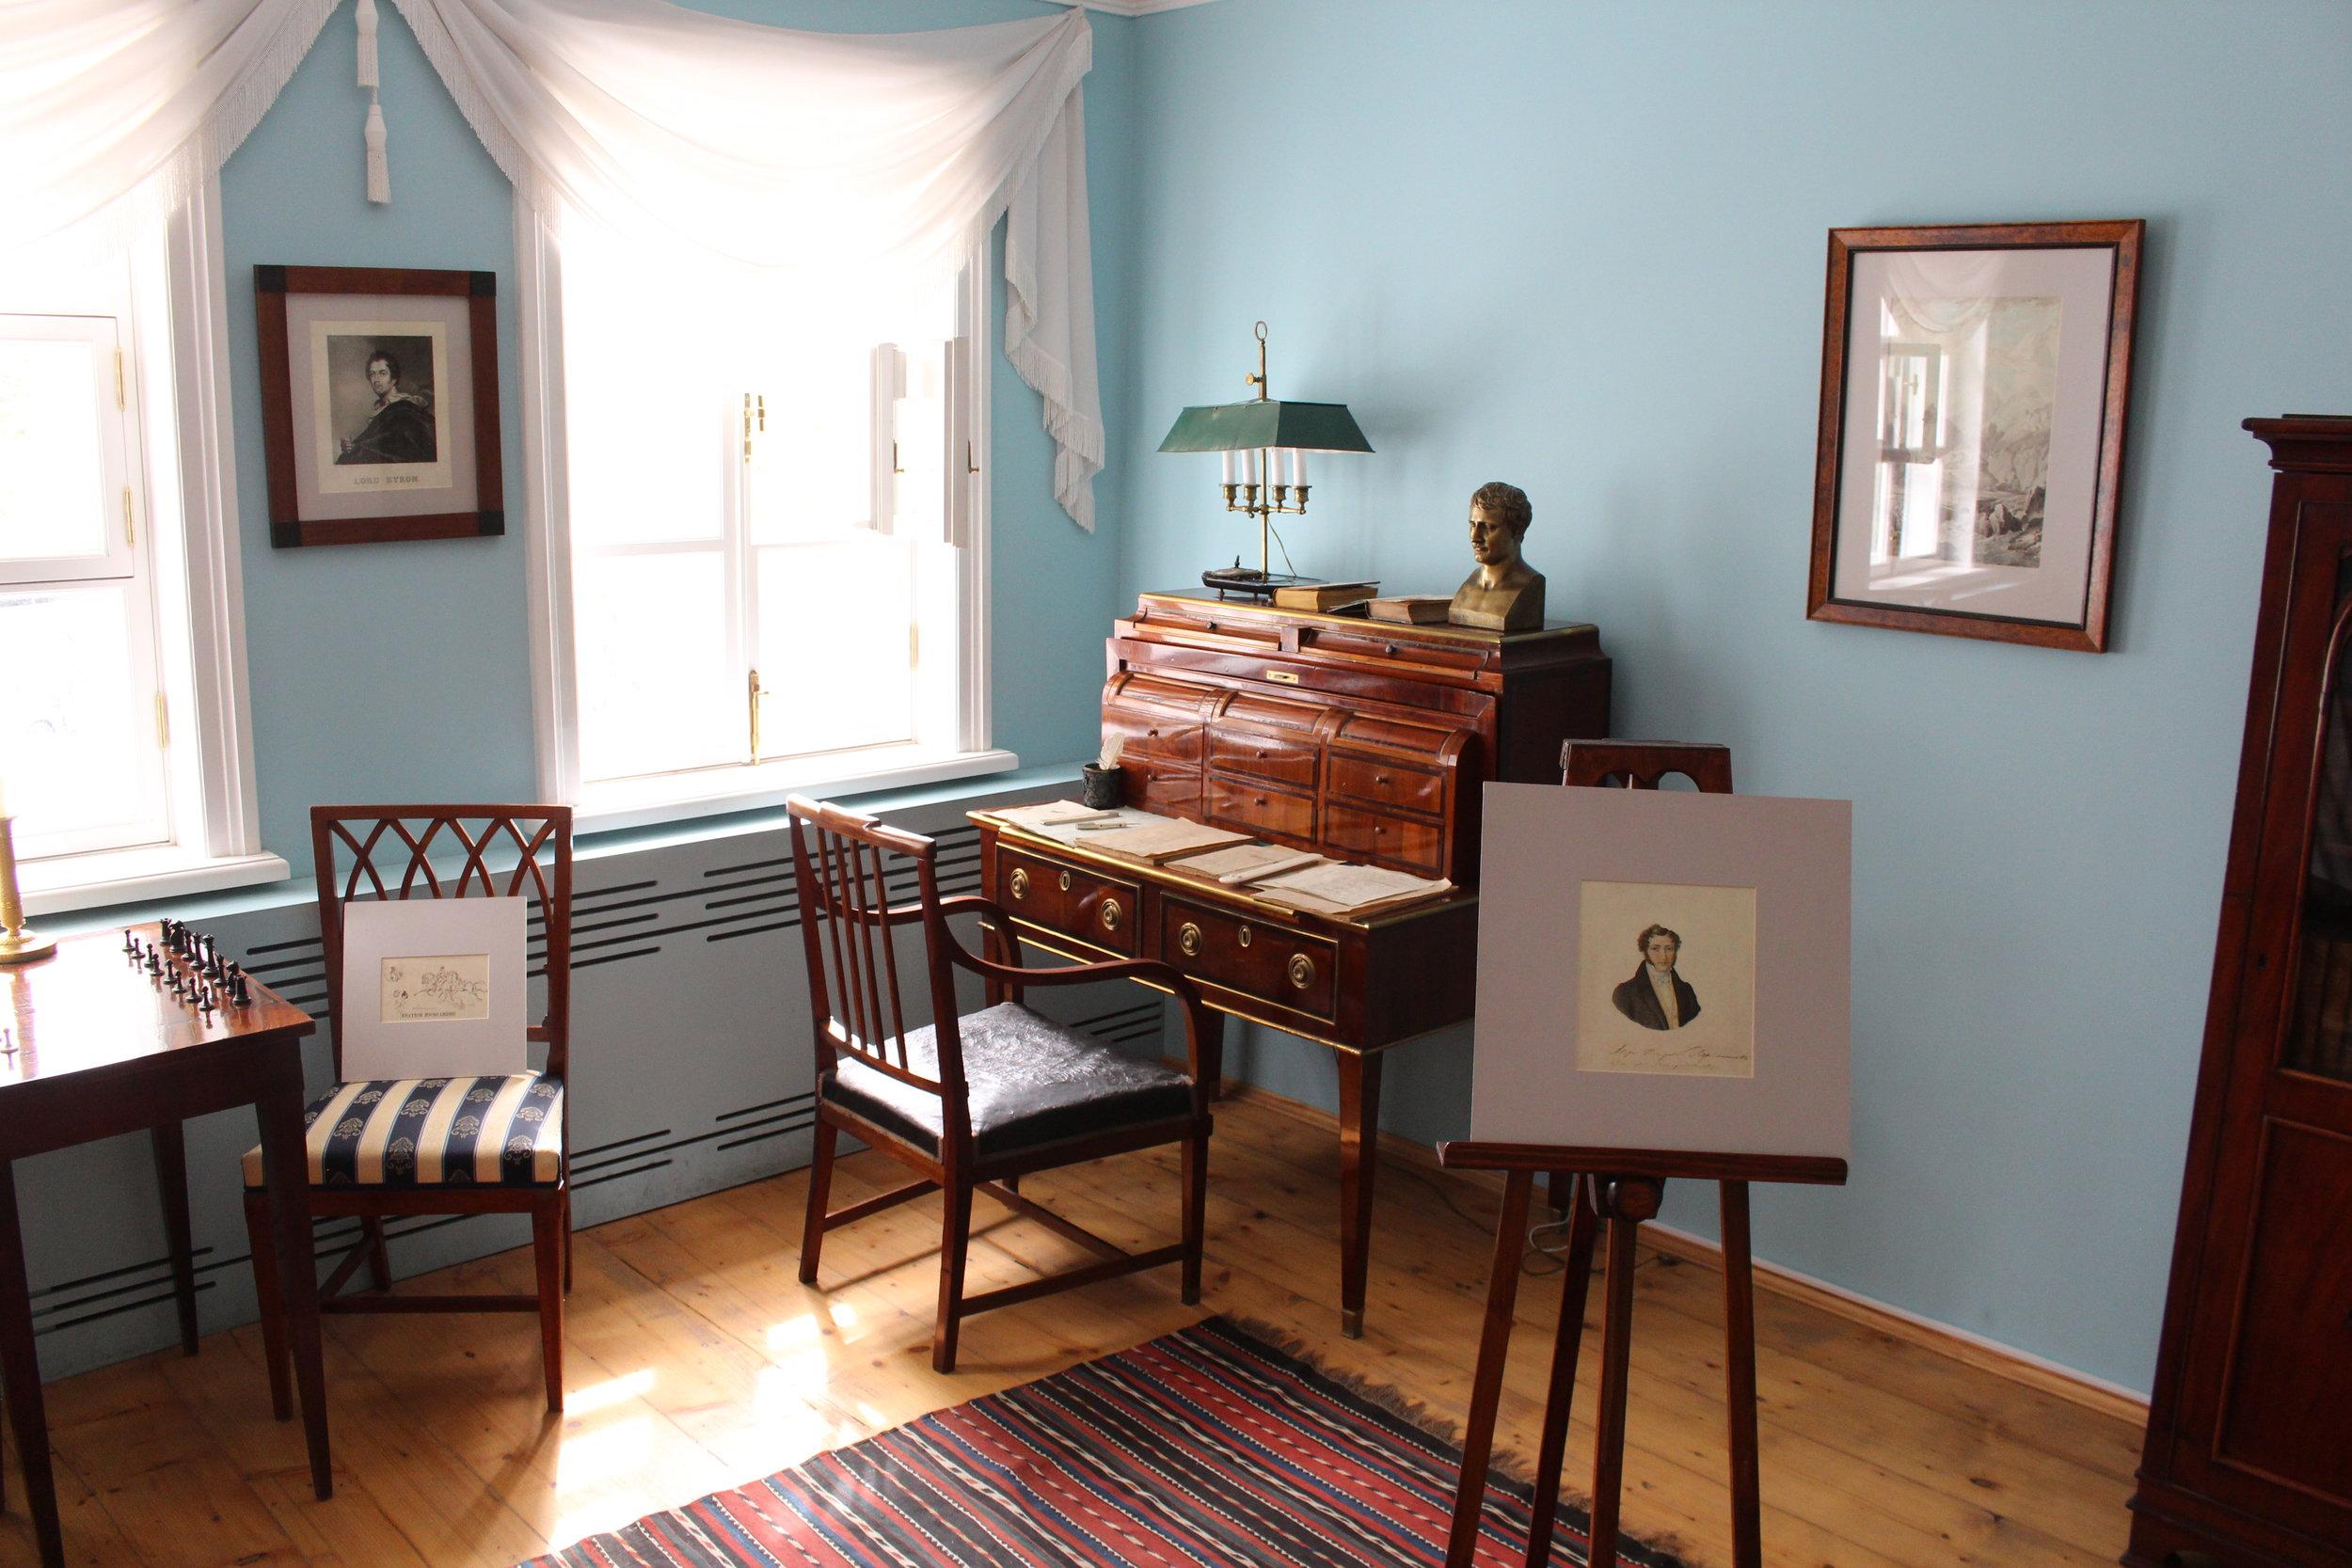 Mikhail Lermontov's study and writing desk